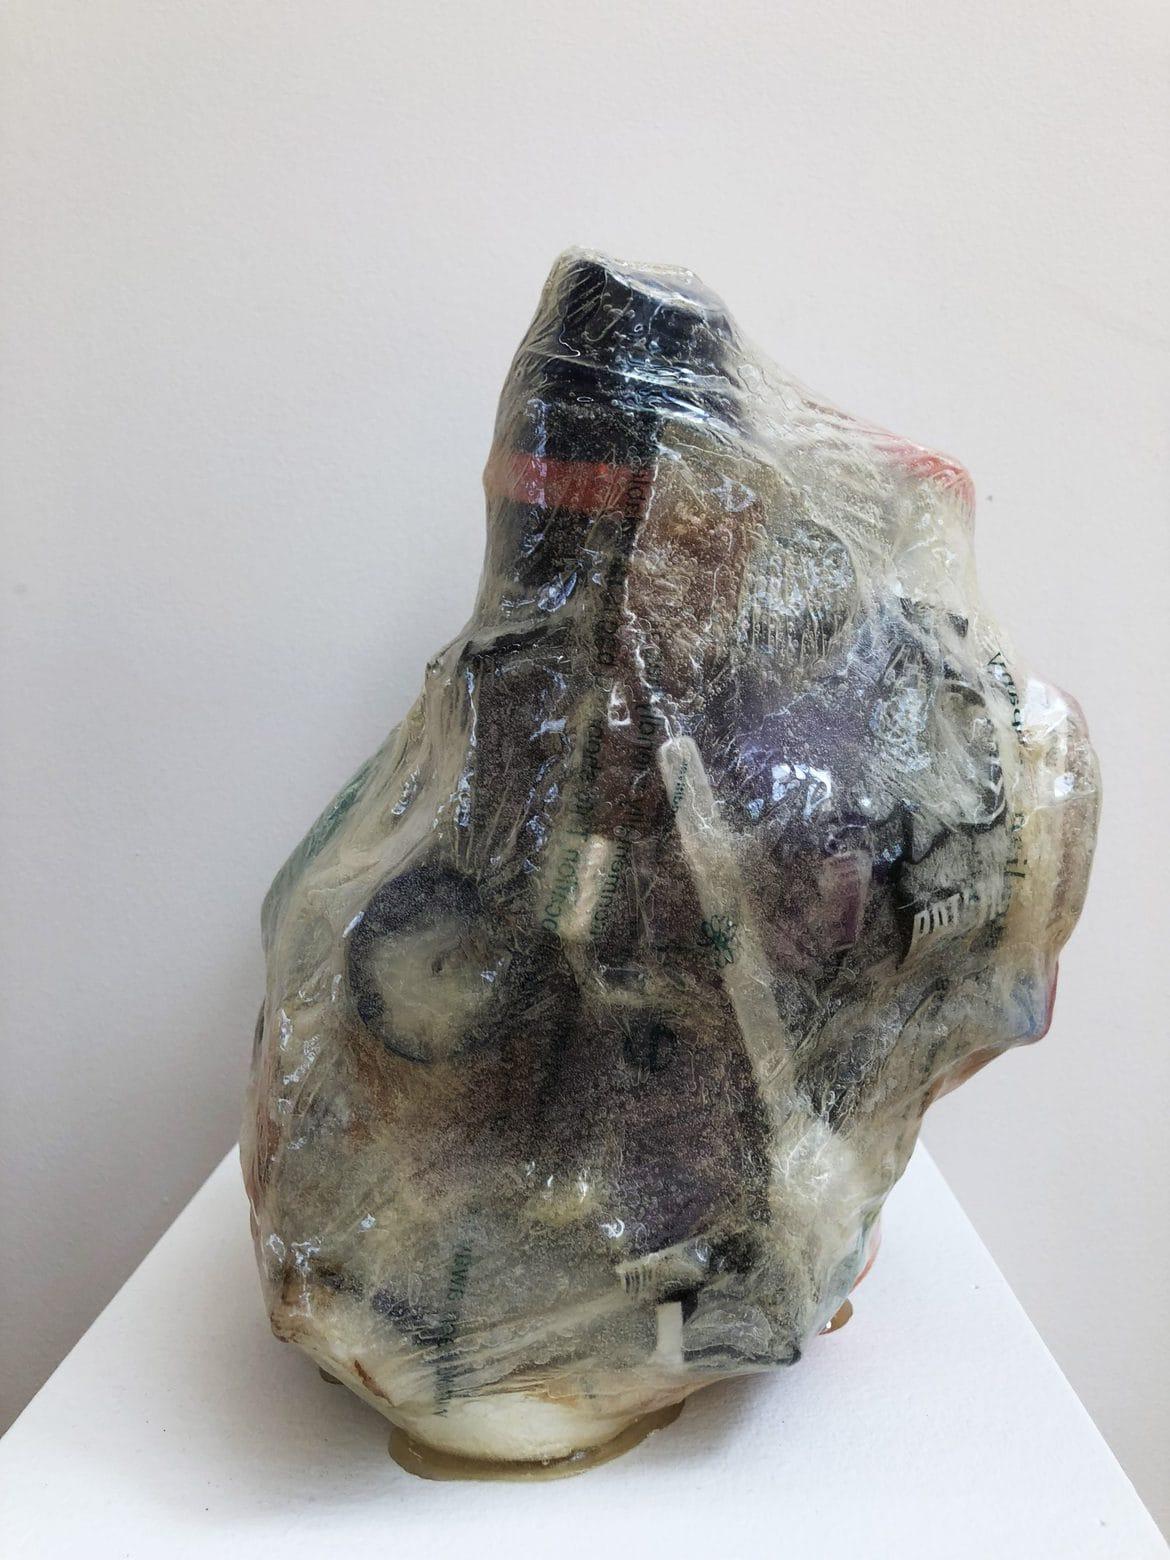 Gary Deirmendjian, 'harris', 2013, salvaged non-organic rubbish, resin and other, 27 x 21 x 18 cm